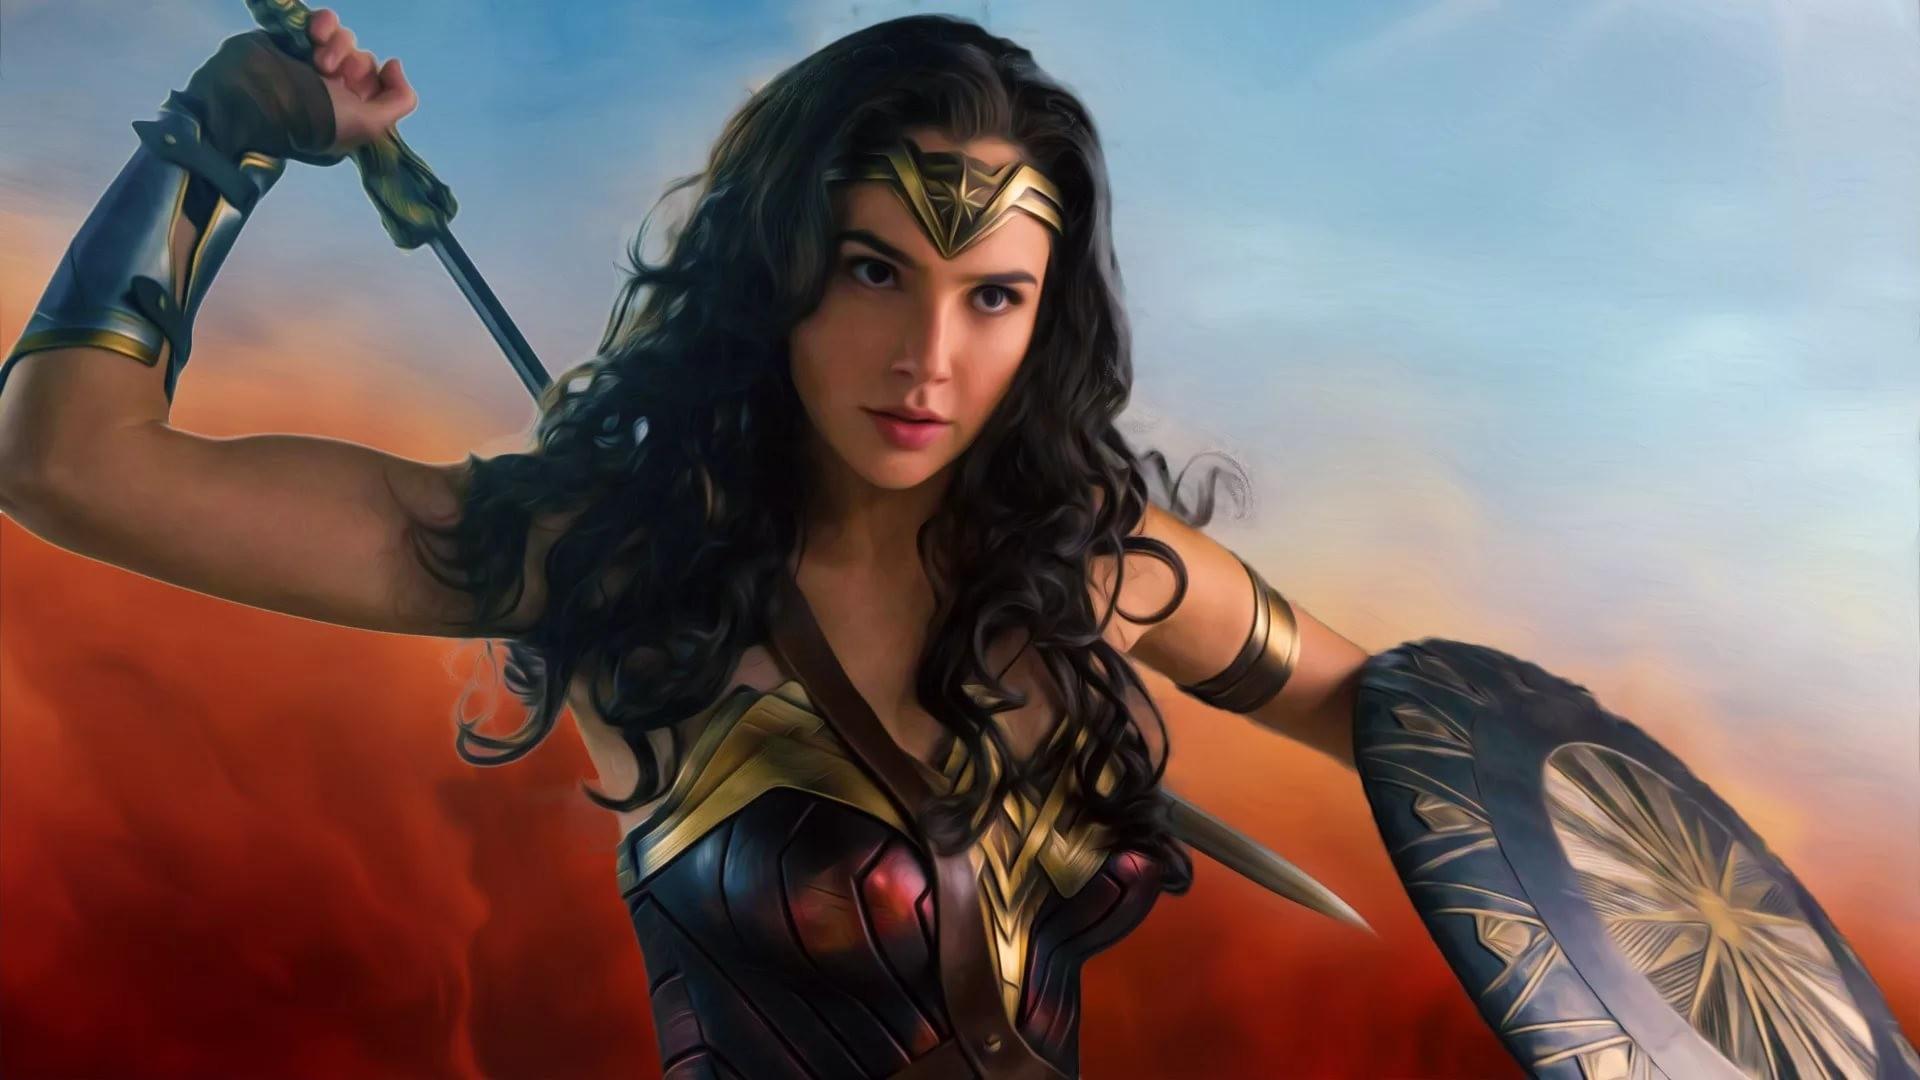 Wonder Woman Wallpaper Screen Savers 67 Images